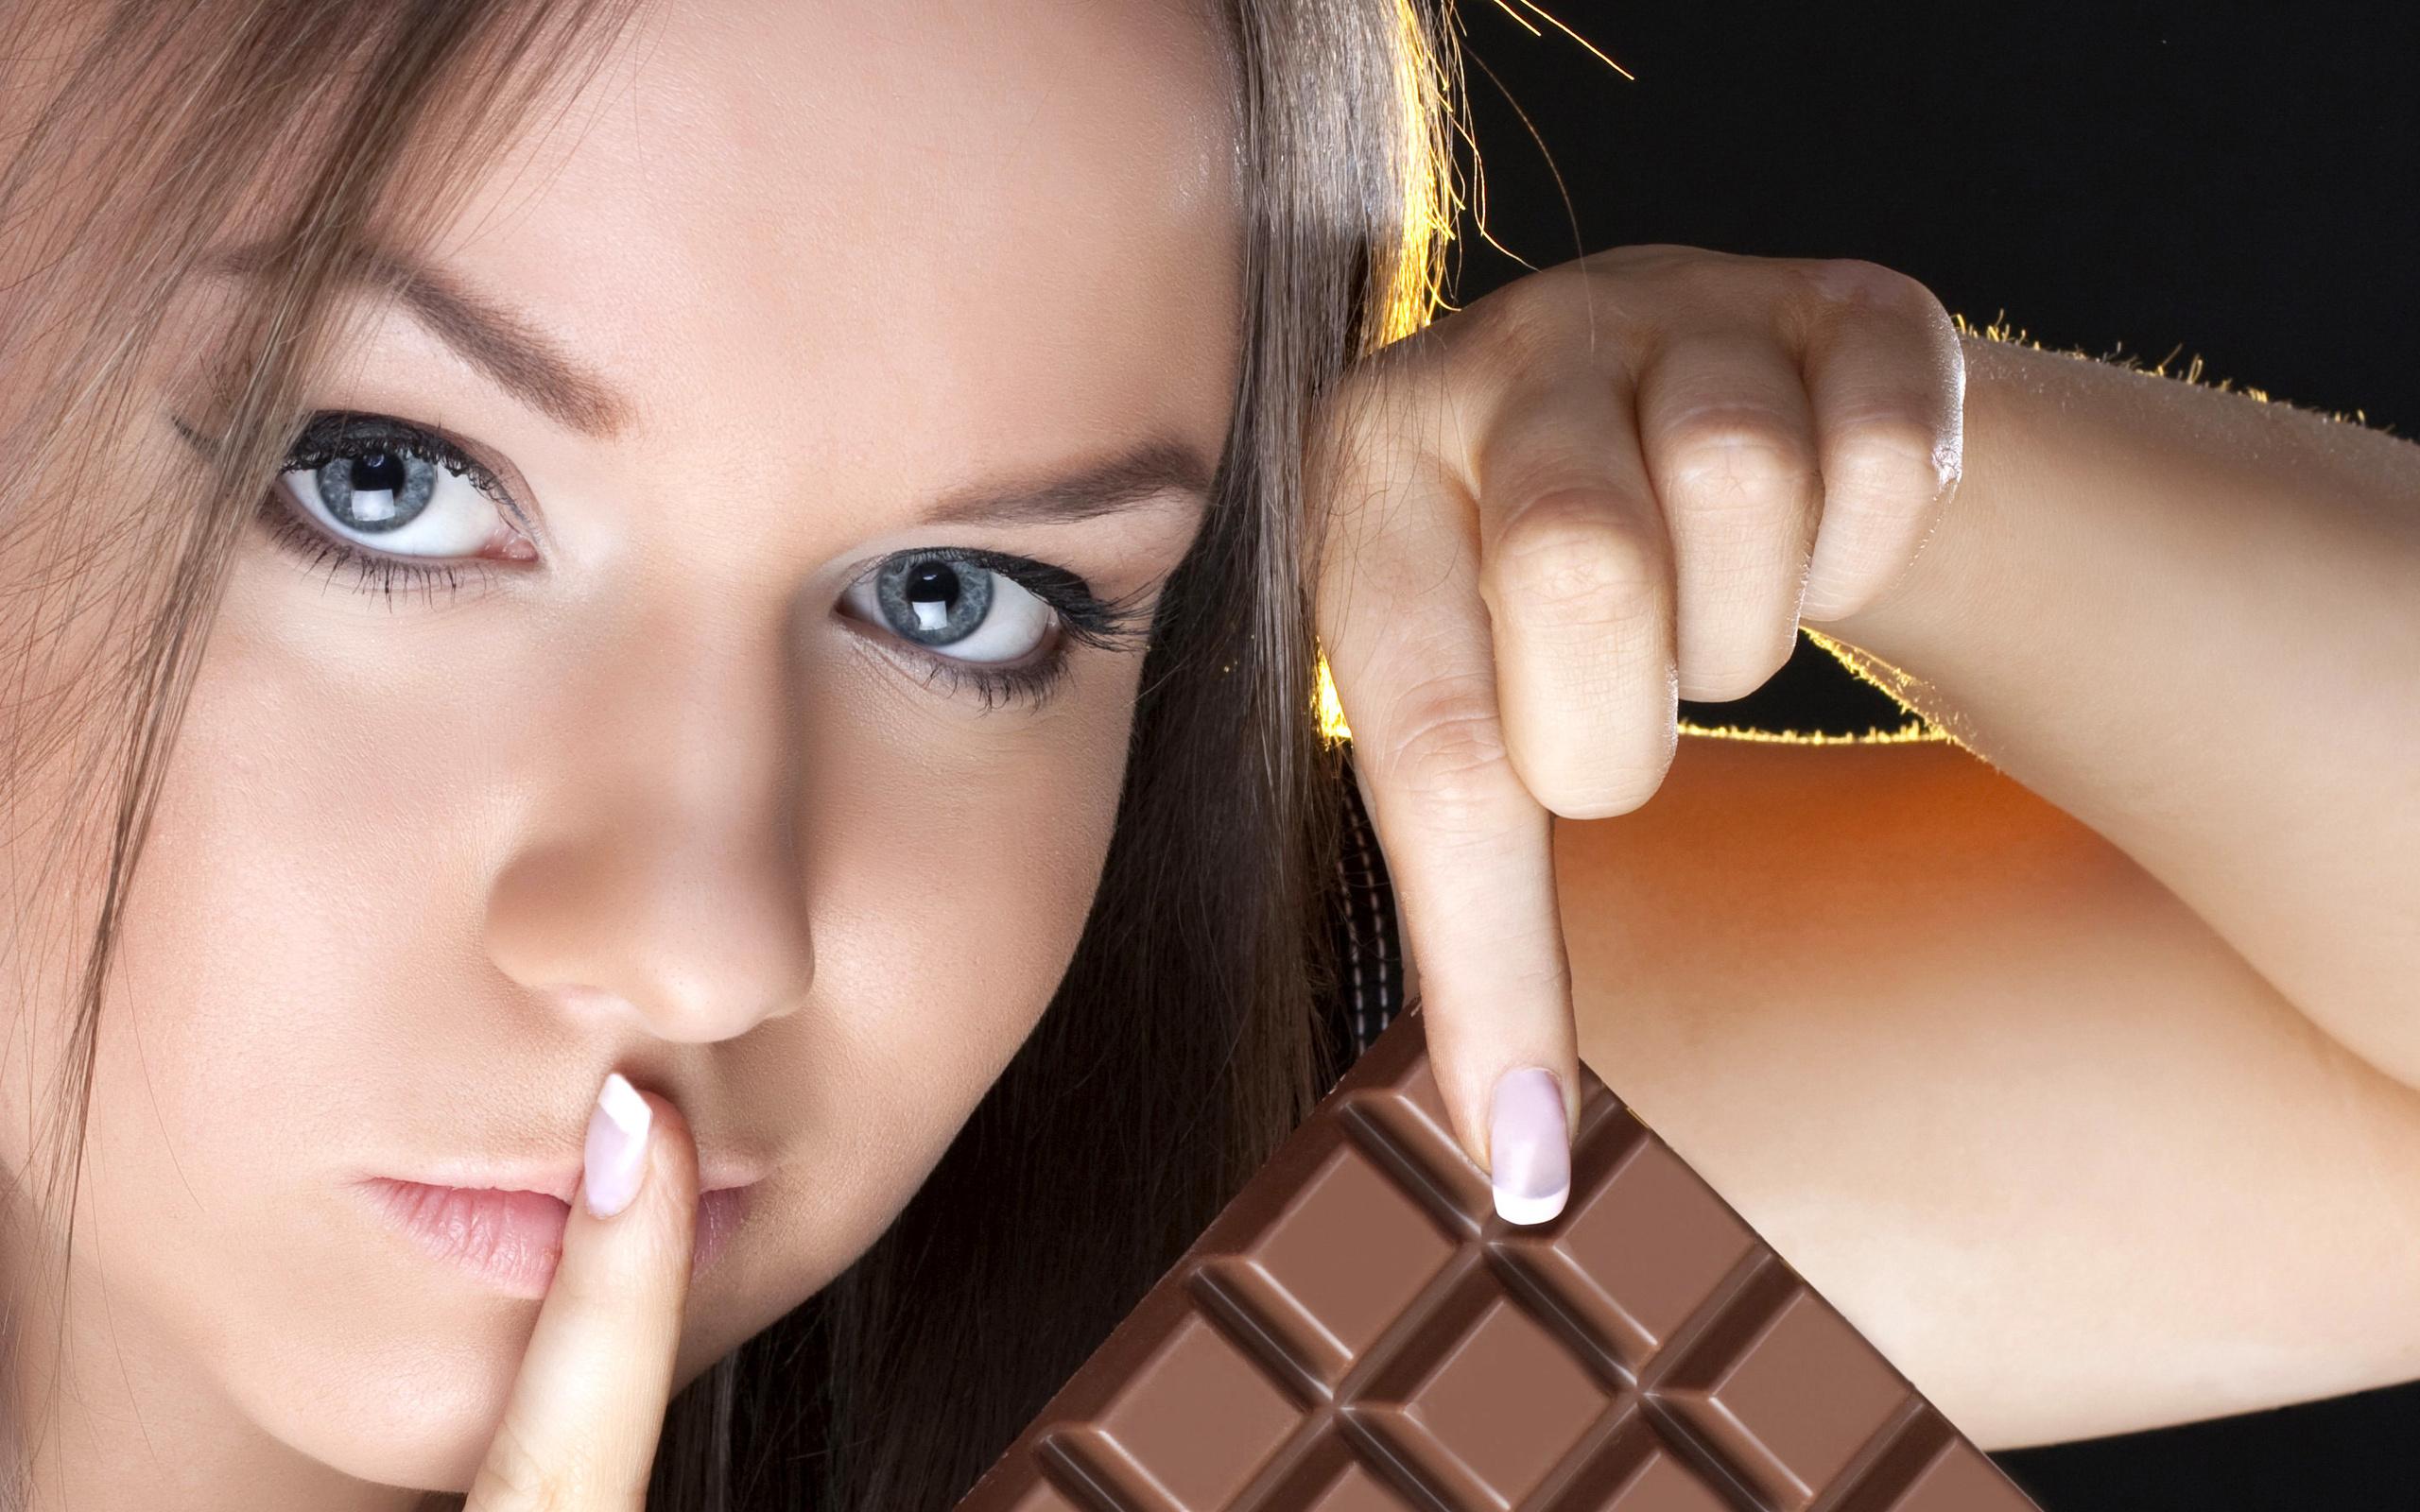 Chocolate pussy